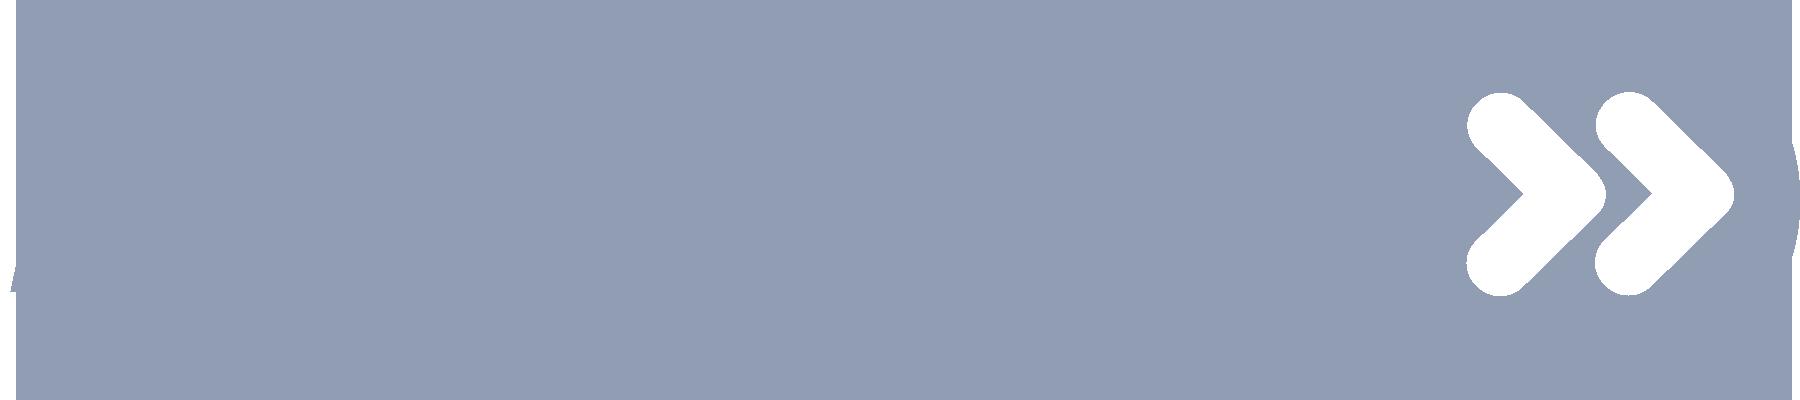 bizspeed-logo copy.png